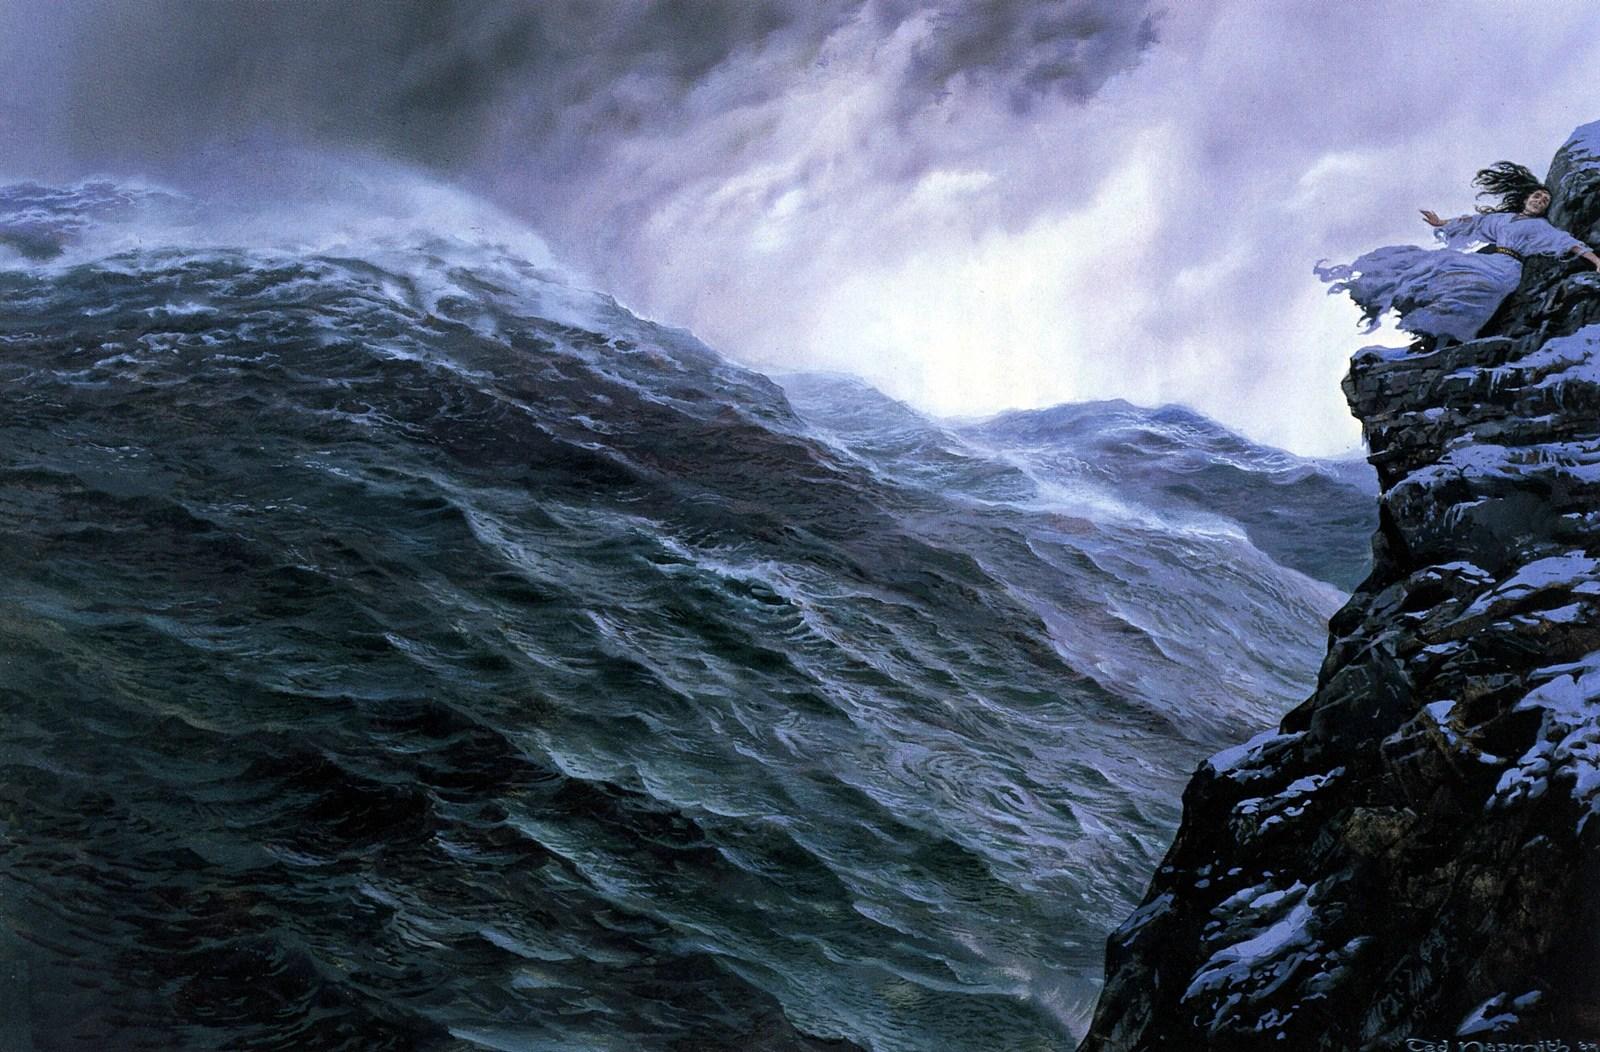 Lotr Fall Wallpaper Image Ted Nasmith The Silmarillion 3 Akallabeth The